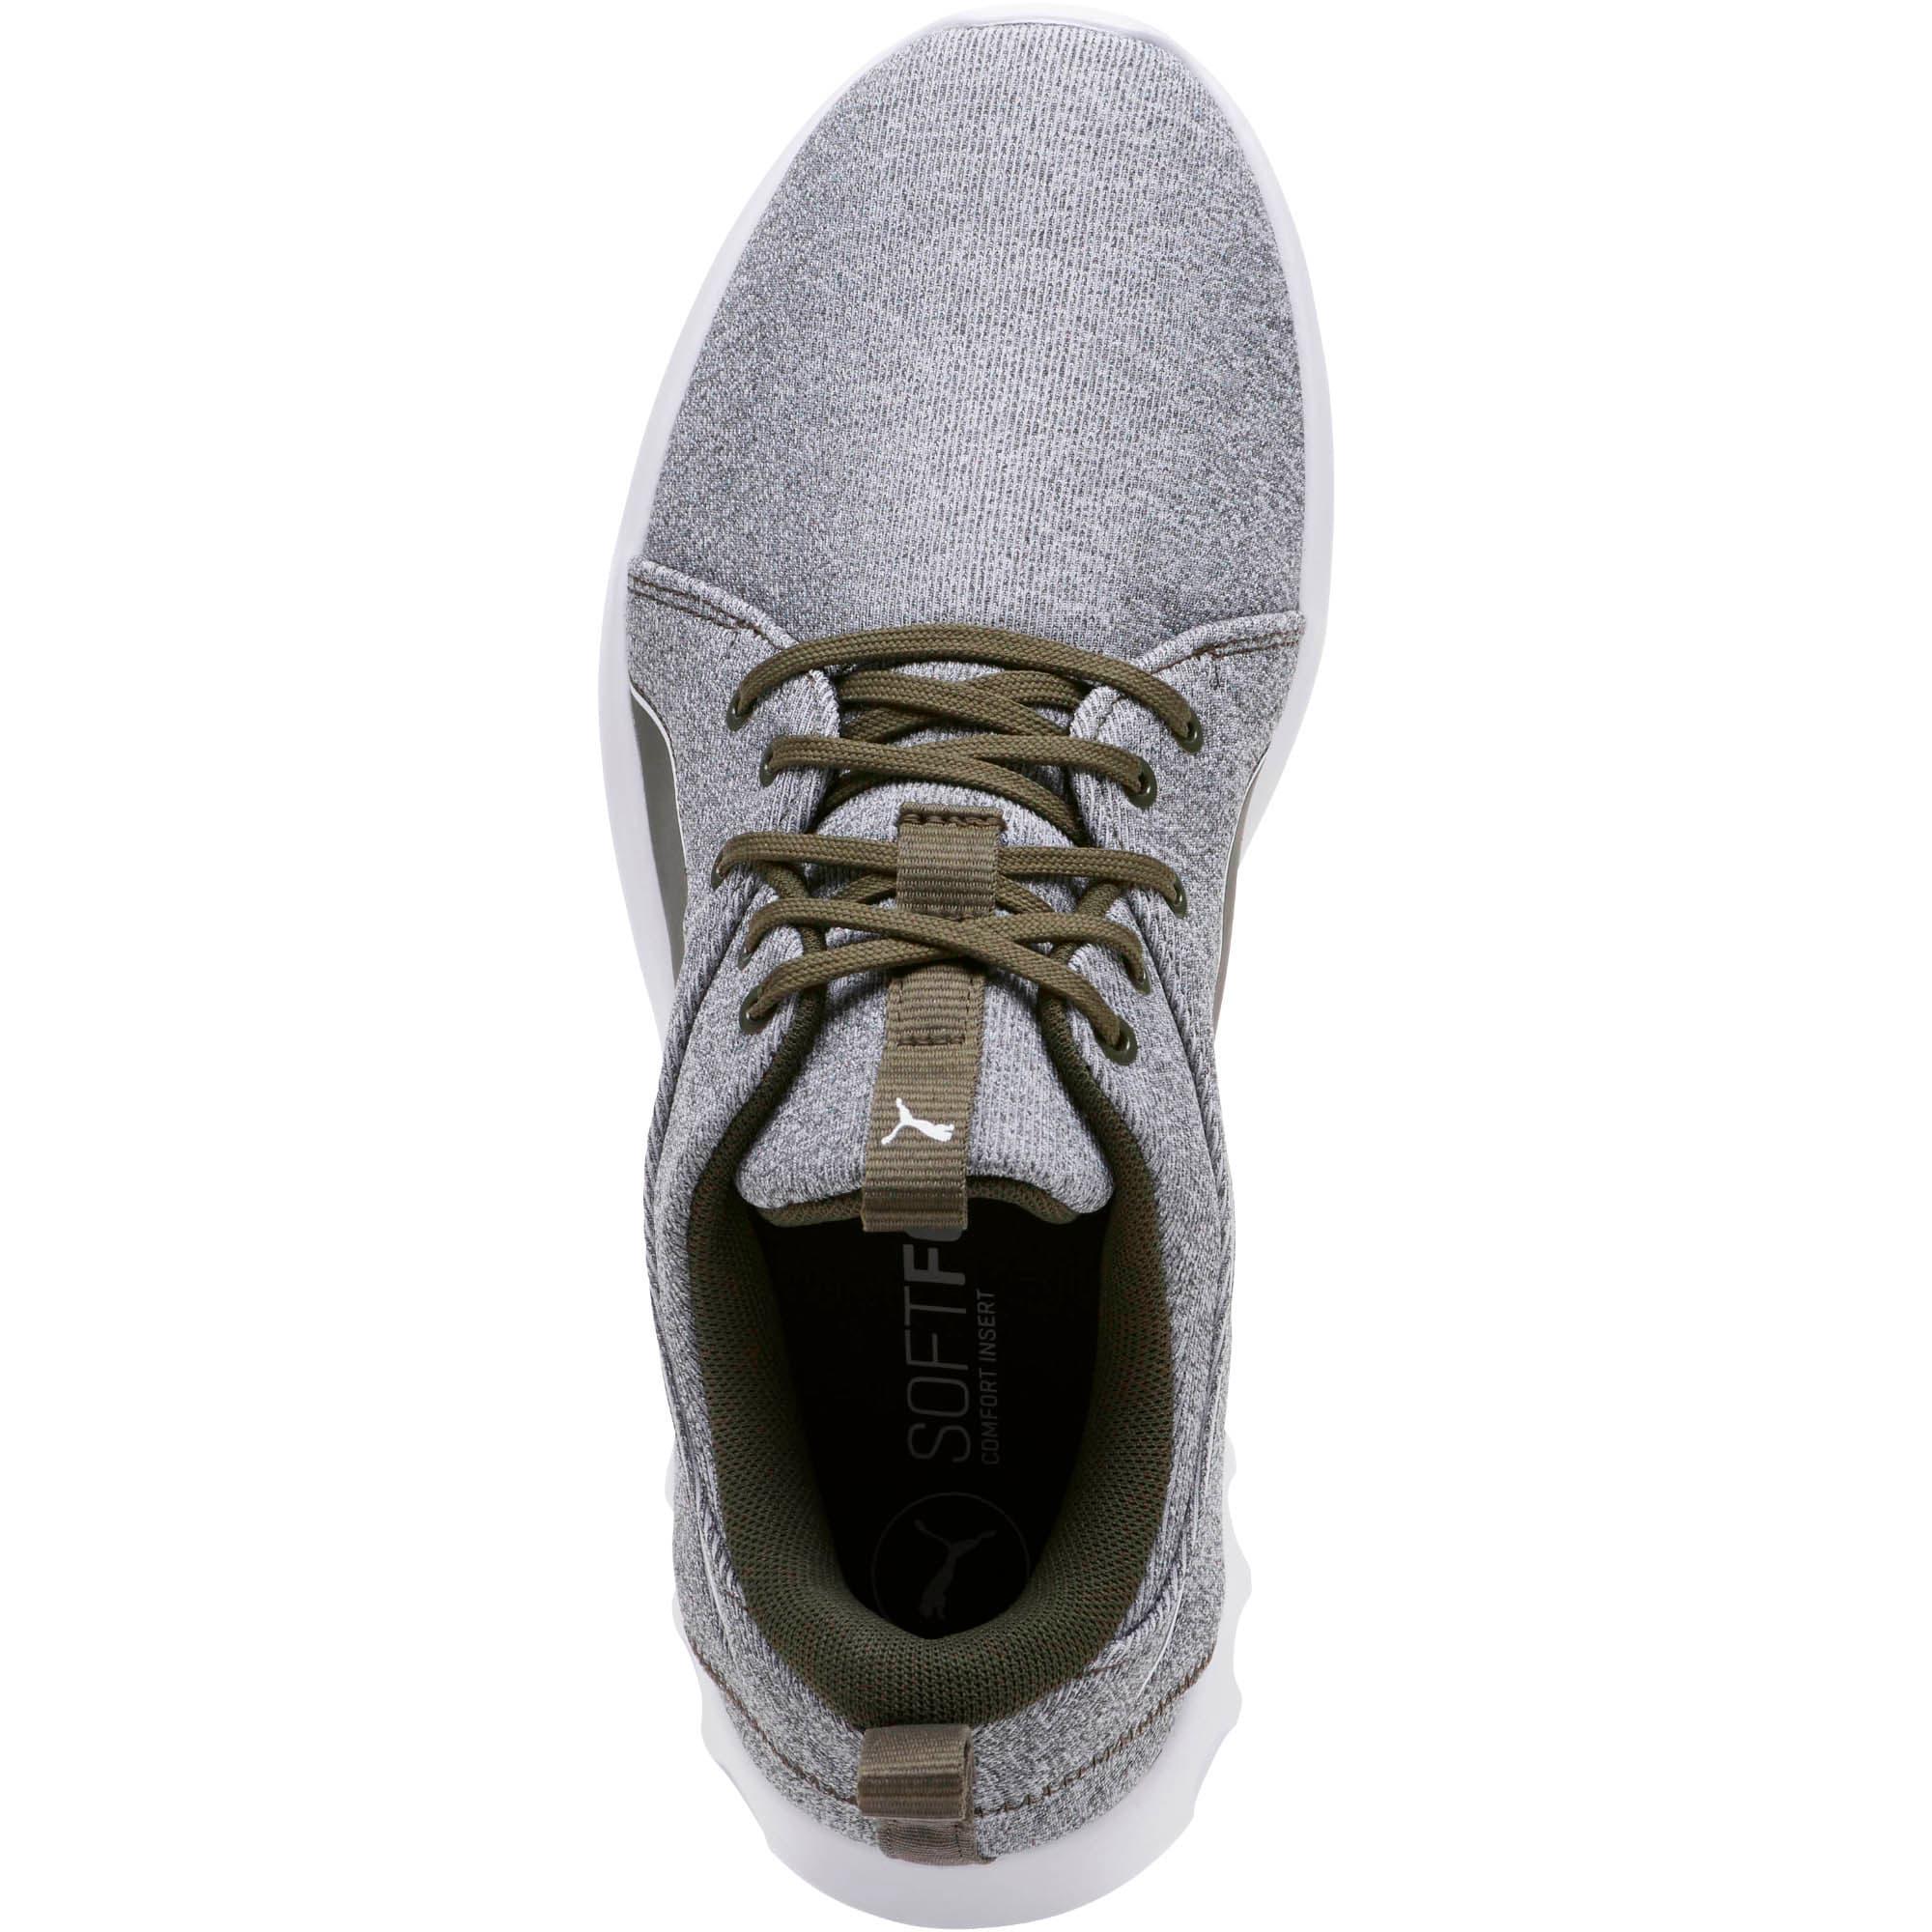 Thumbnail 5 of Carson 2 Men's Nautical Running Shoes, Forest Night-Puma White, medium